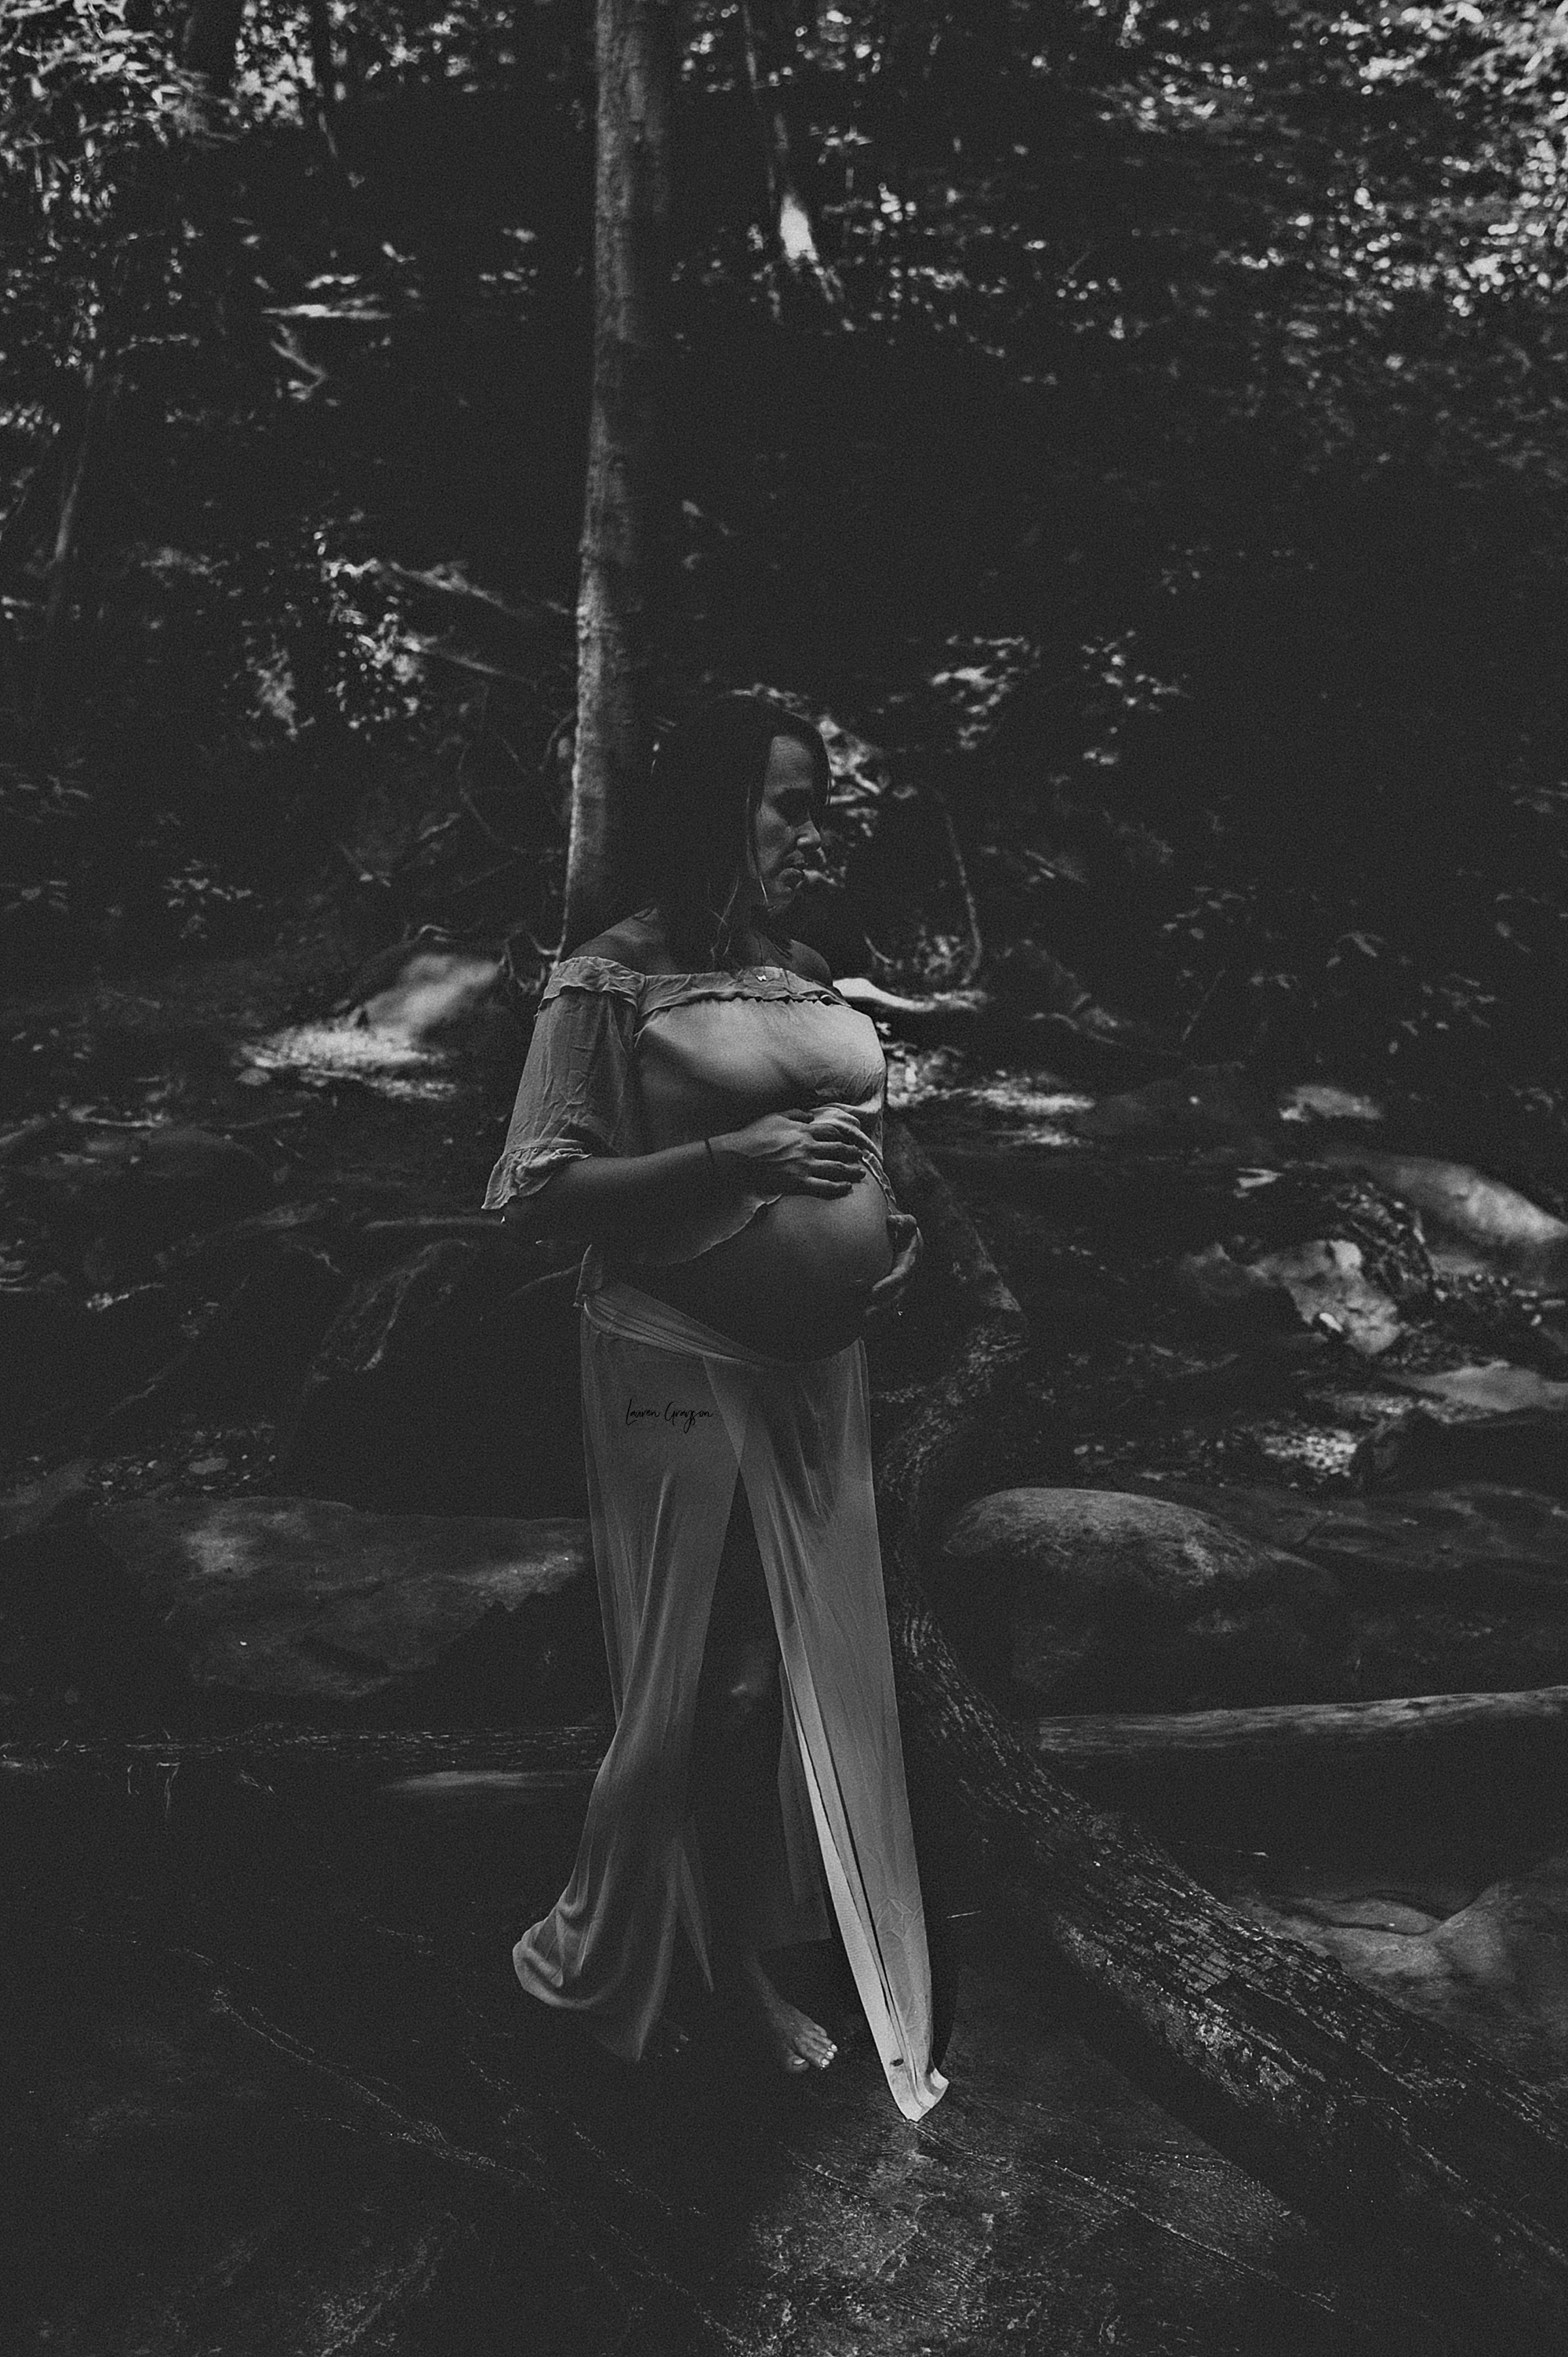 lauren-grayson-photography-akron-ohio-maternity-photographer-waterfall-sarah-f_0003.jpg